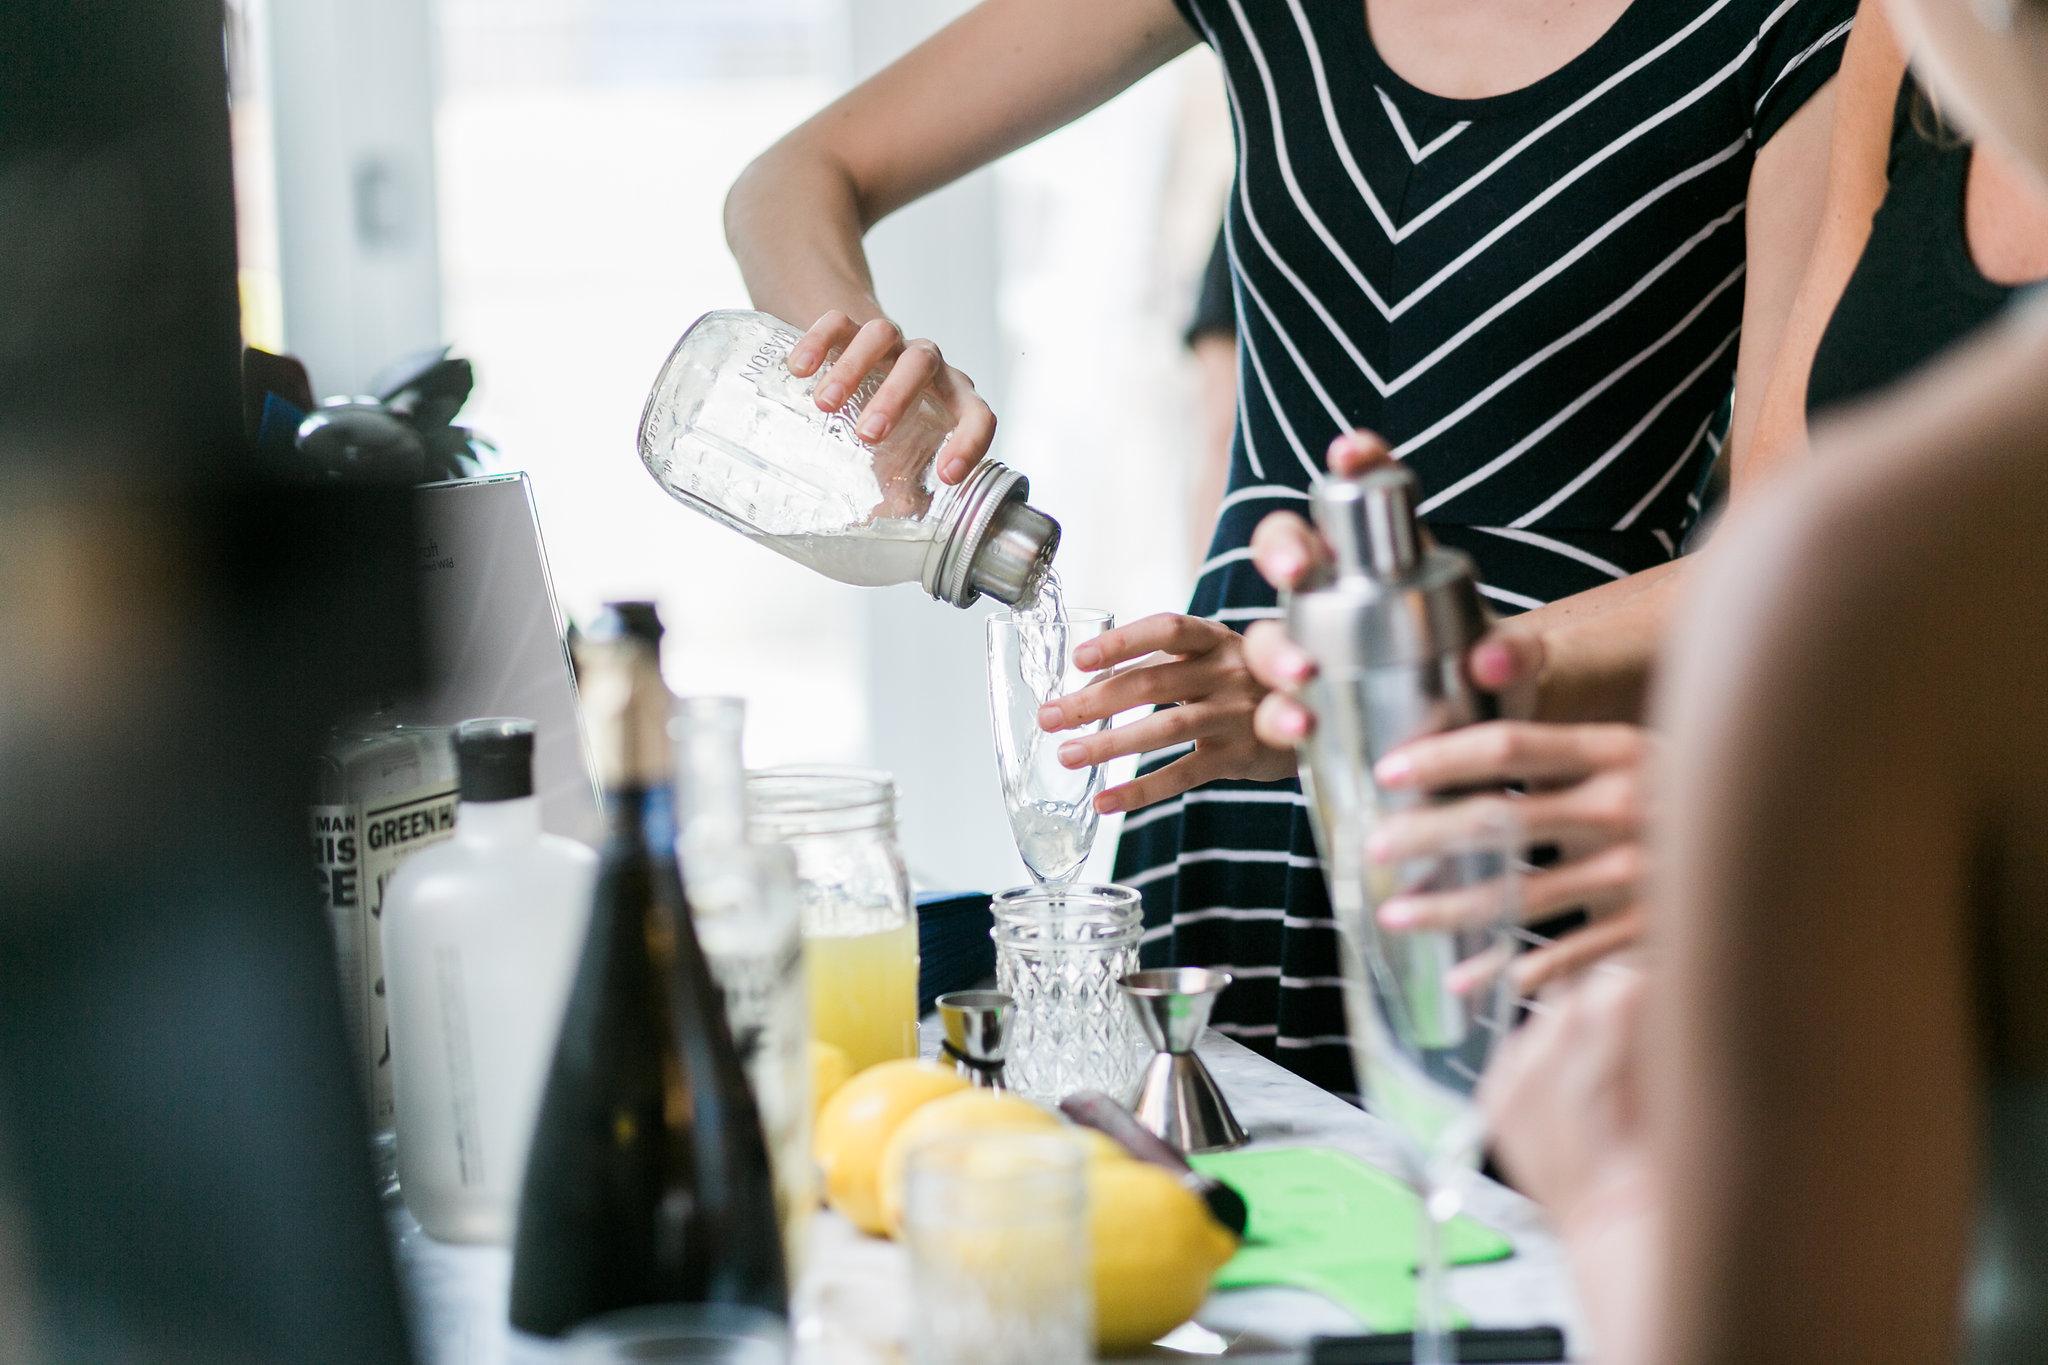 Mixing and making. Photo by Jen Eun.